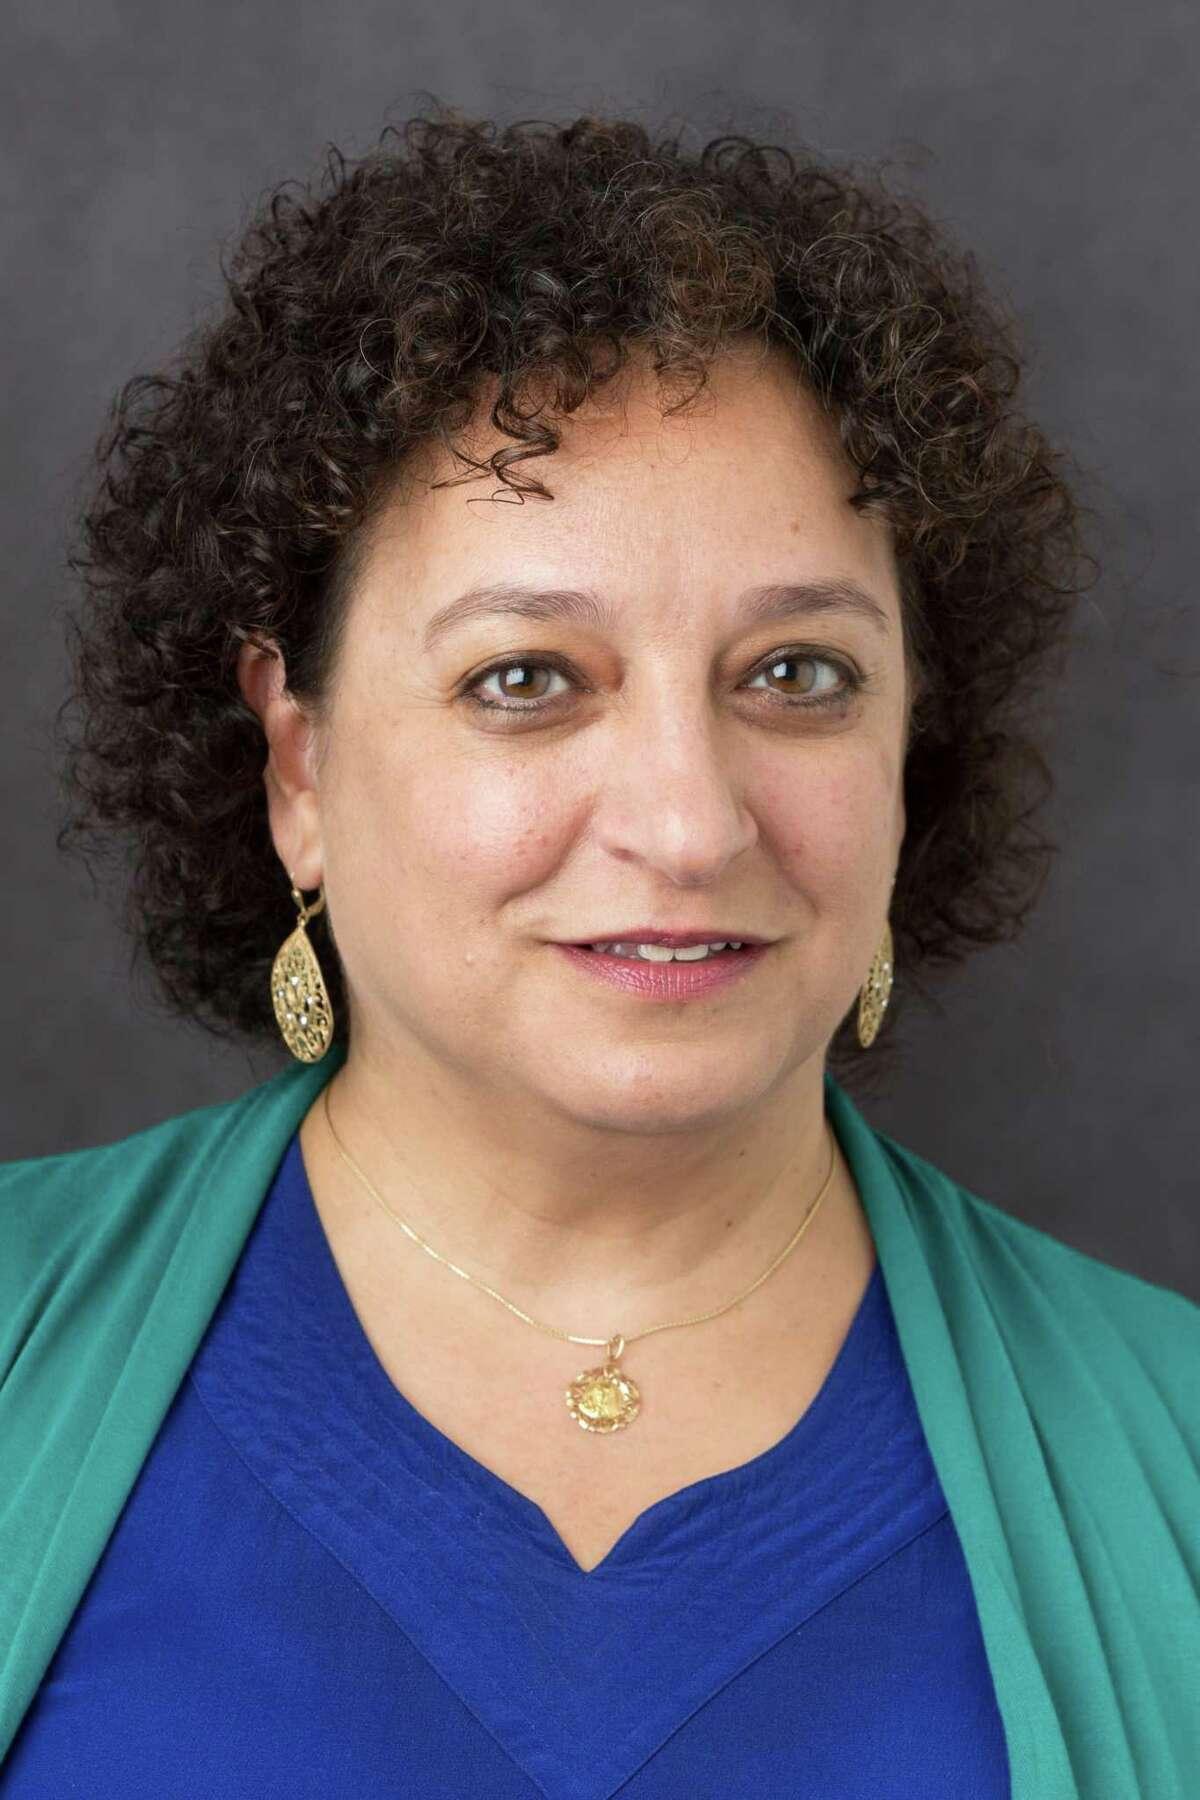 Anna-leila Williams of Hamden, professor of medical sciences at the Frank H. Netter MD School of Medicine at Quinnipiac University.